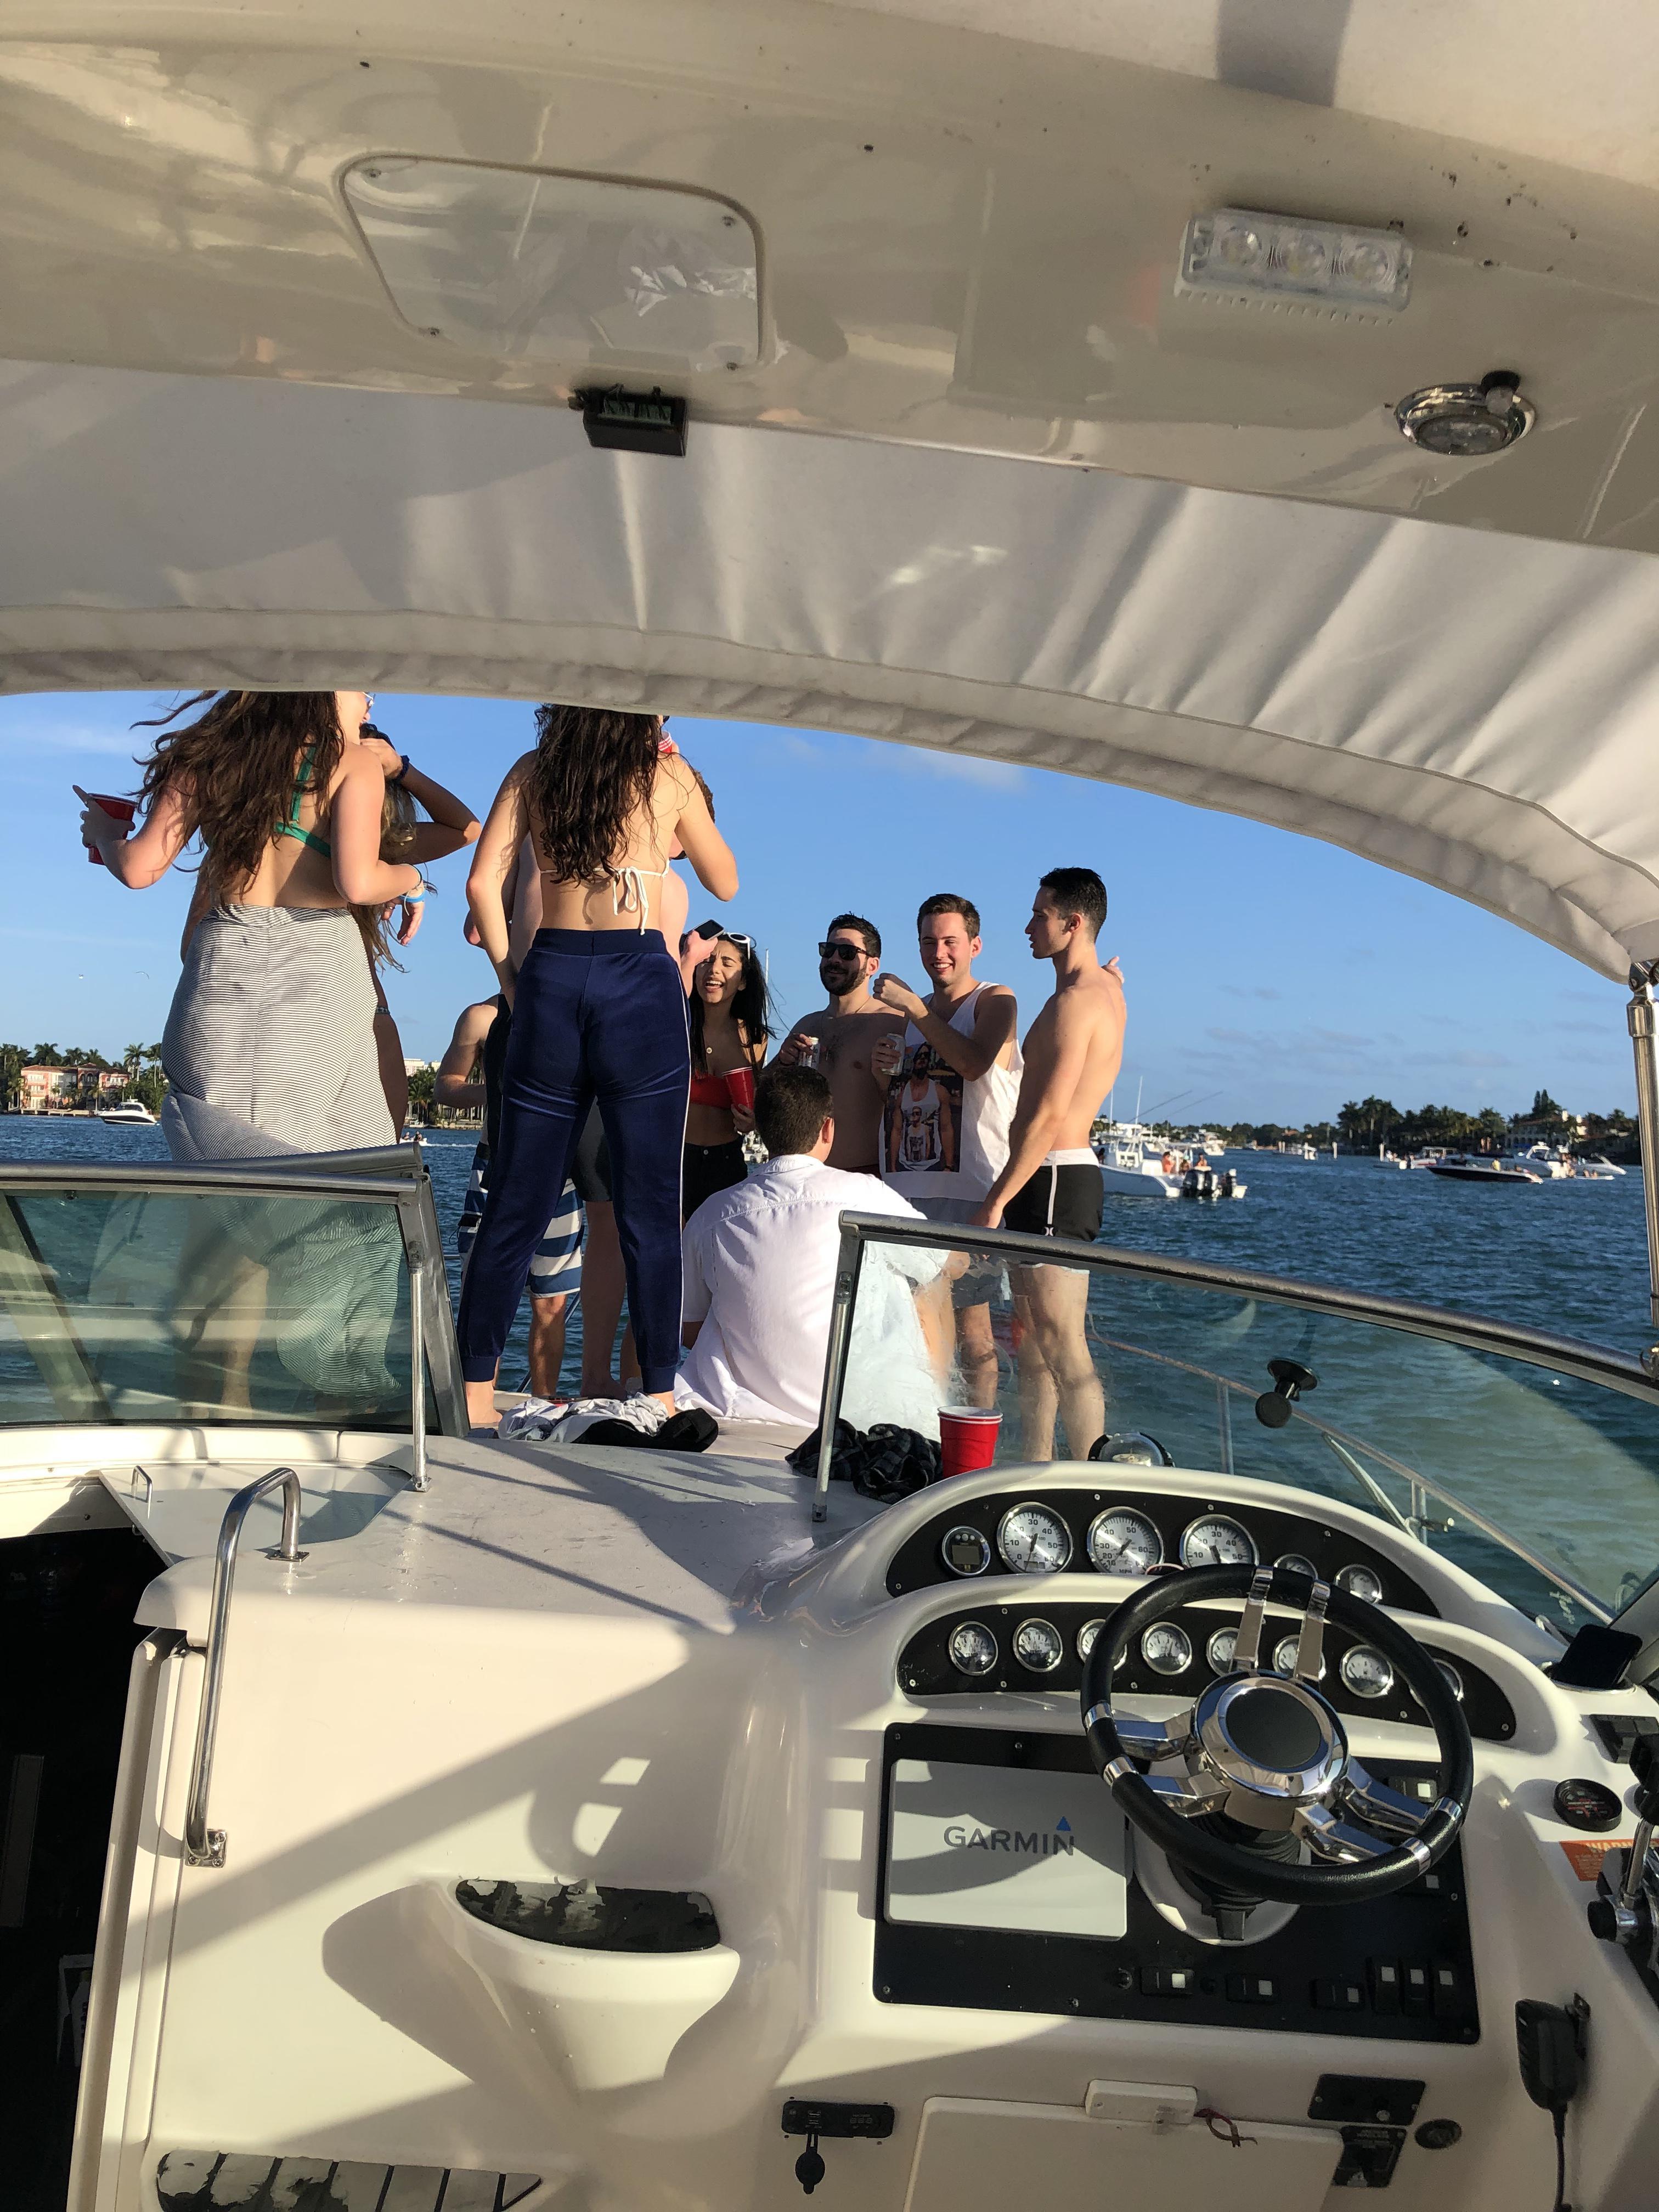 "Cruiser 33"" Yacht and jetski rental in Miami | GetMyBoat"